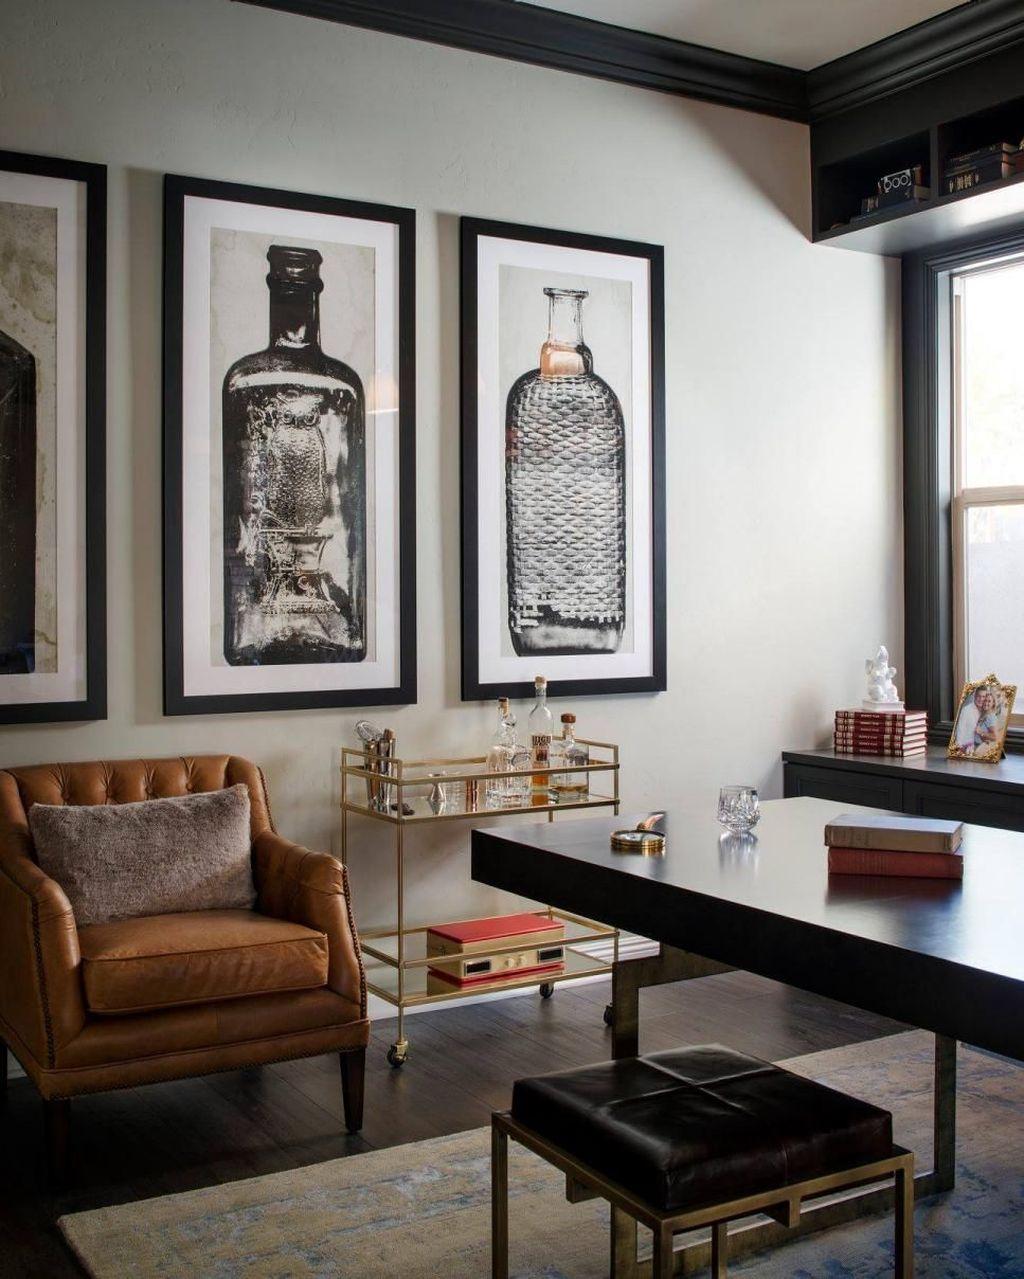 The Best Office Artwork Design Ideas 22